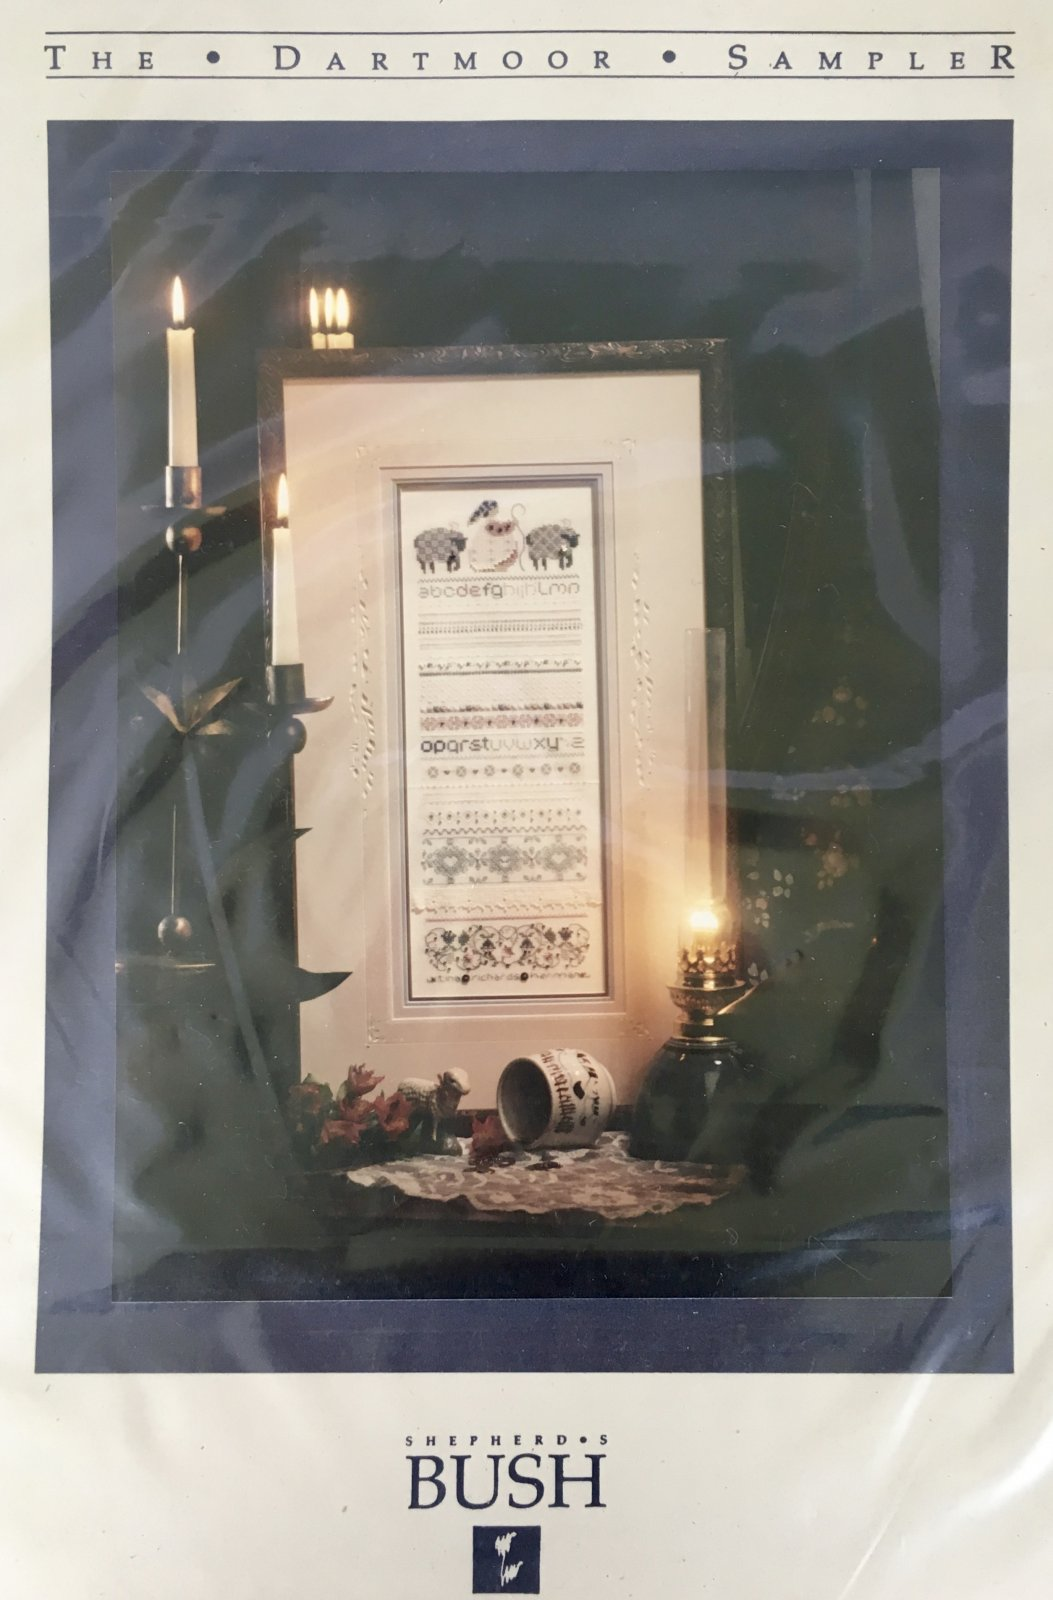 Shepherd's Bush: The Dartmoor Sampler Kit